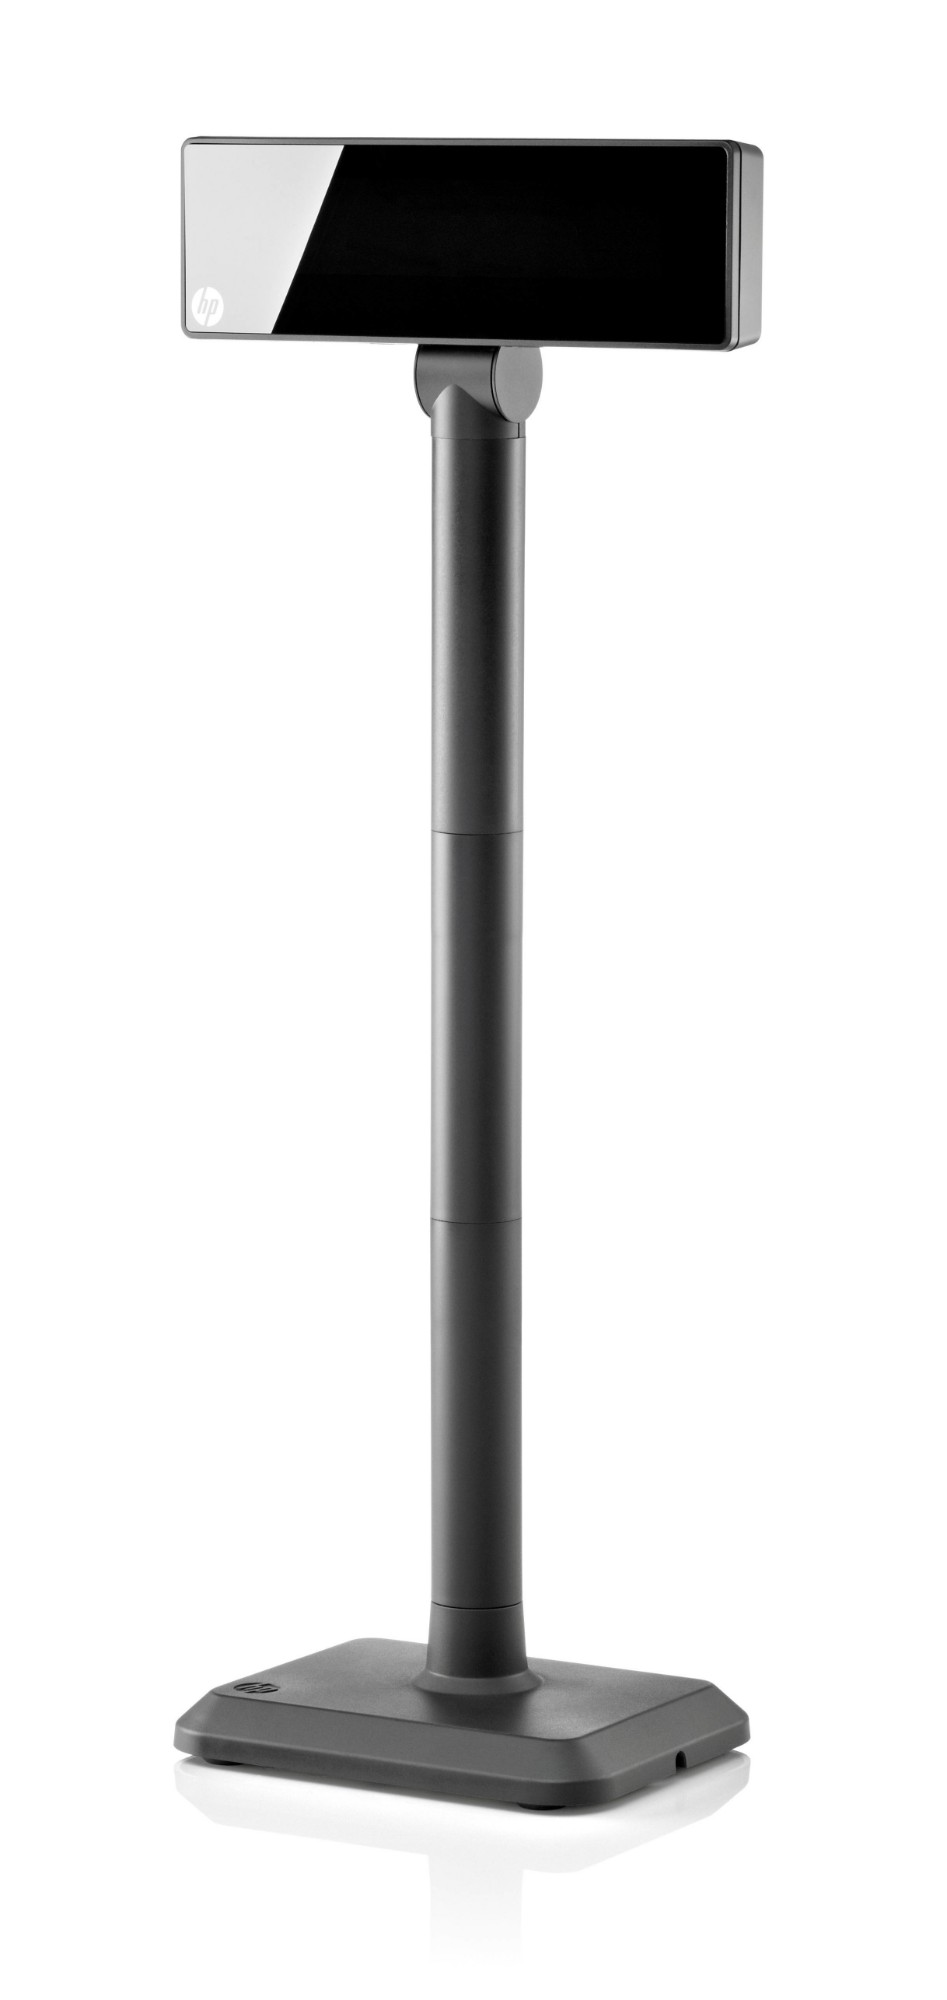 Hp Pole Display Ld220 Driver